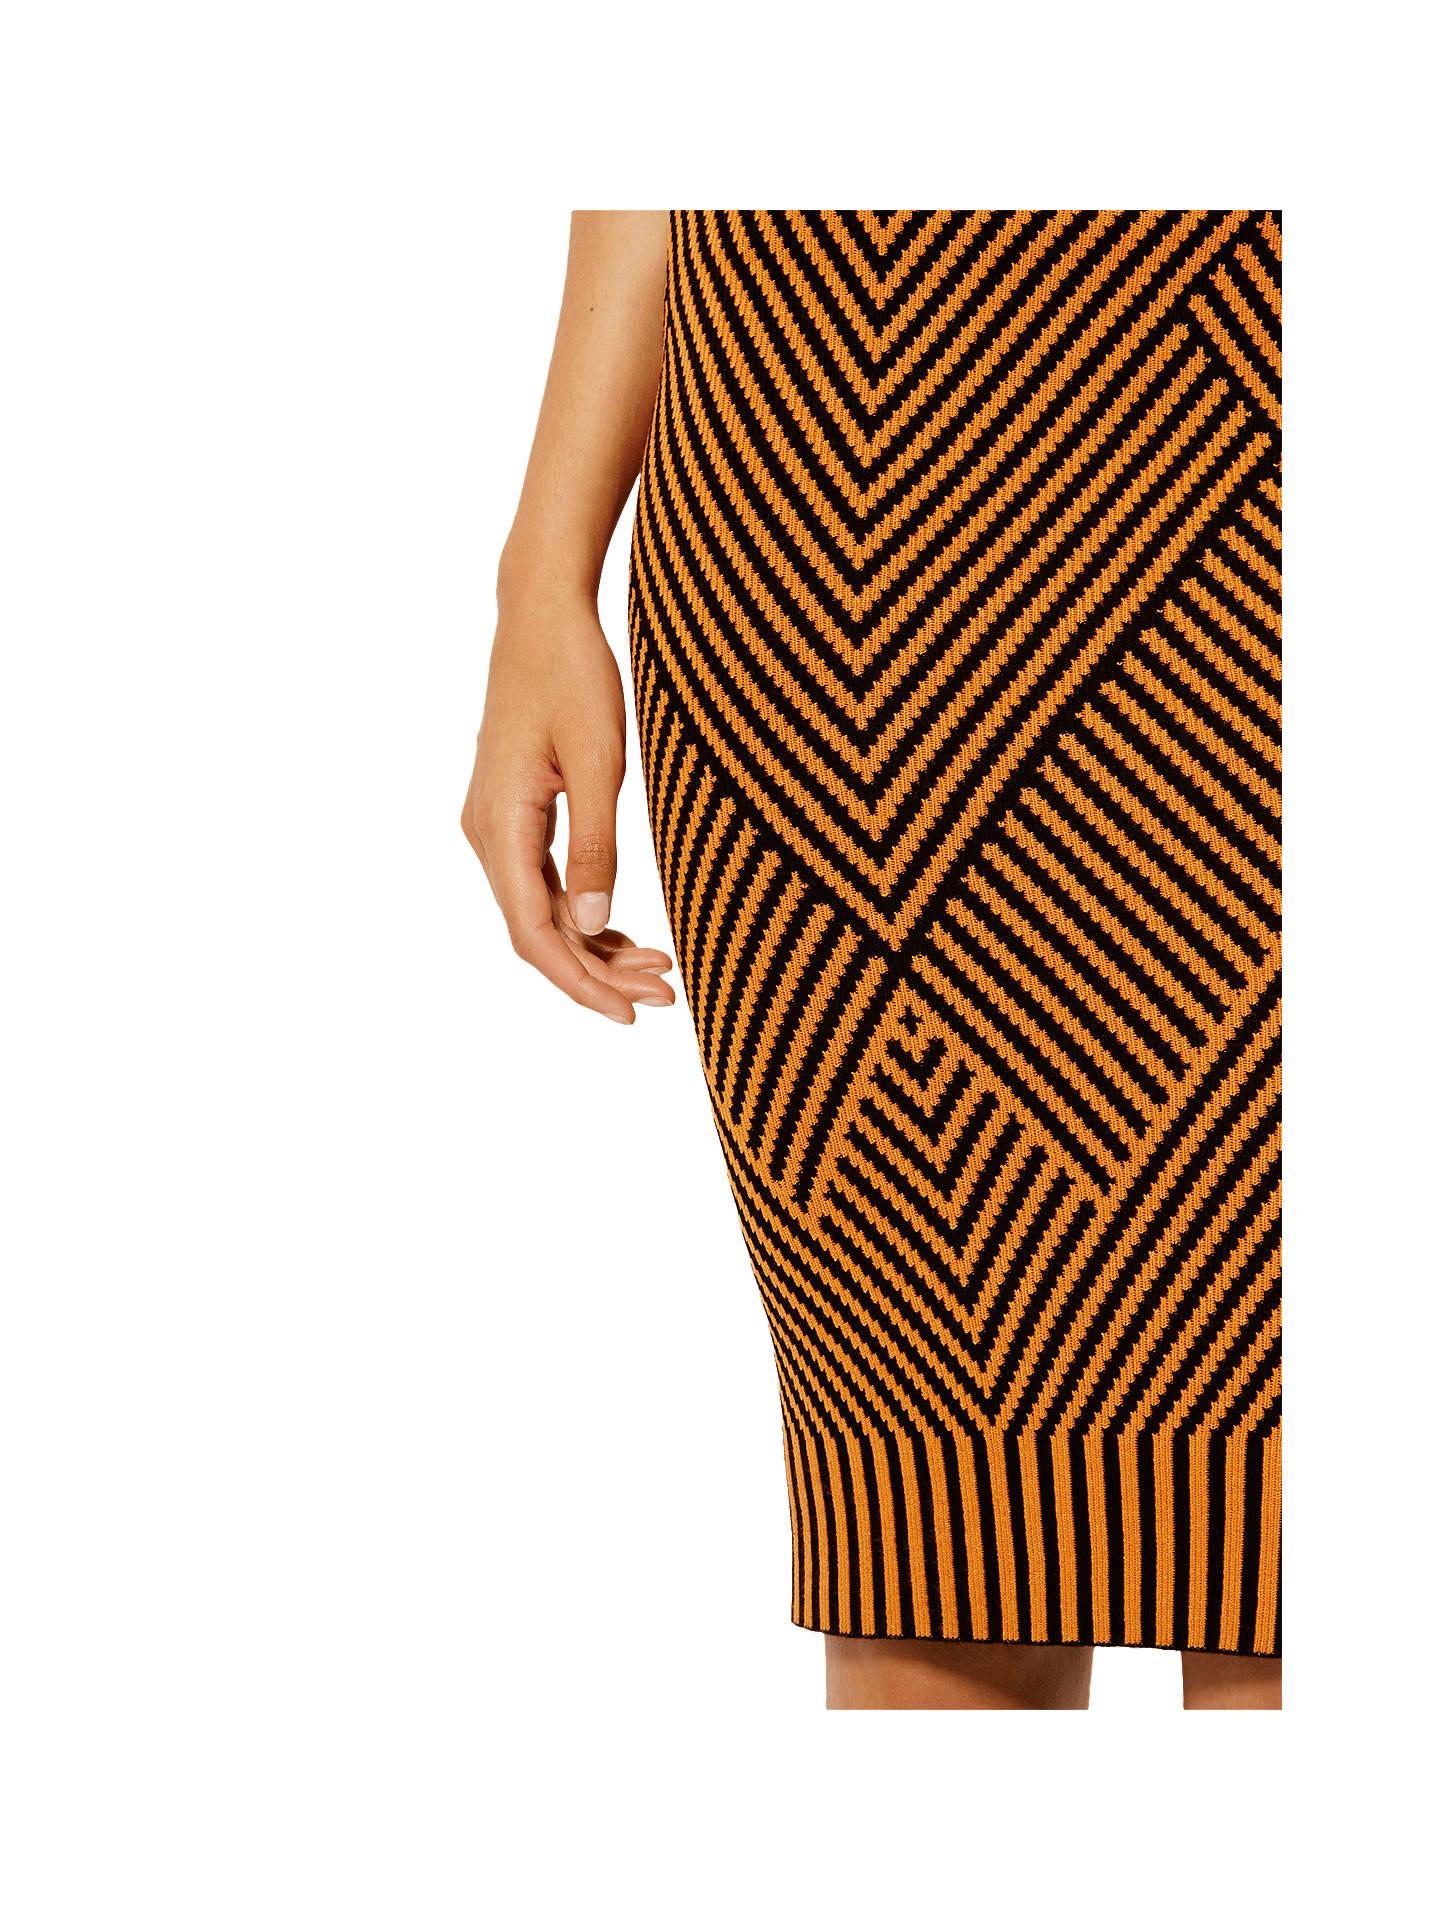 d72a009a62 ... Buy Karen Millen Contrast Knitted Pencil Skirt, Orange/Multi, XS Online  at johnlewis